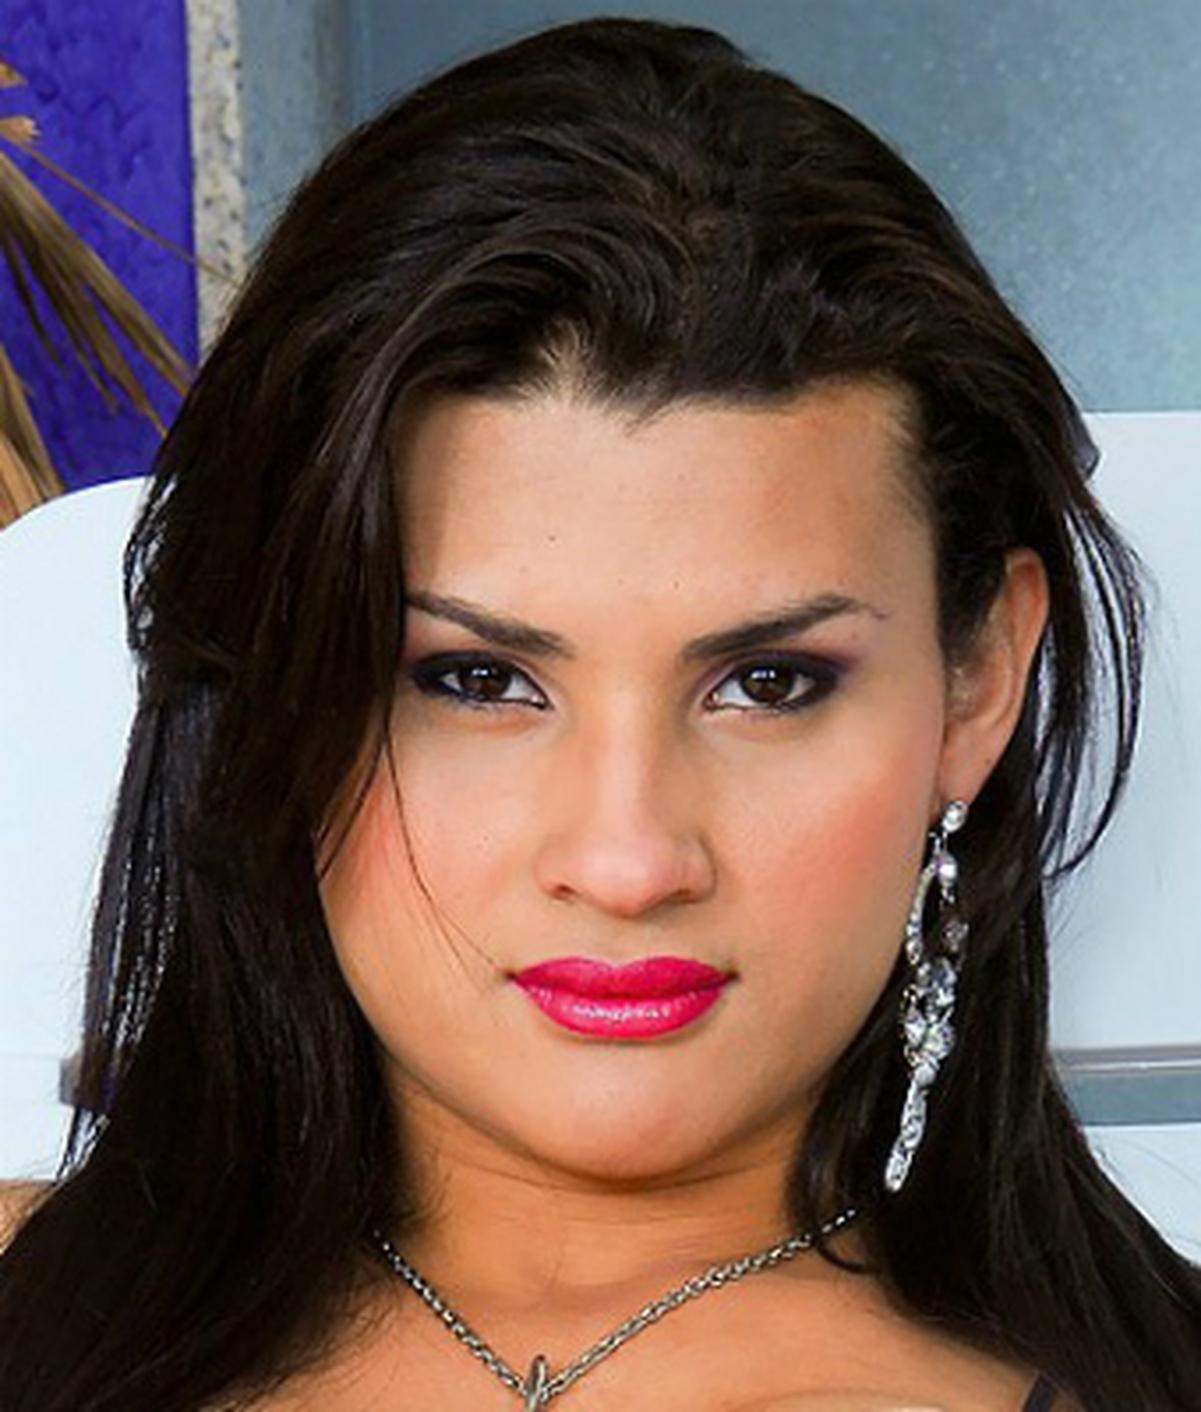 Alinne Garcia